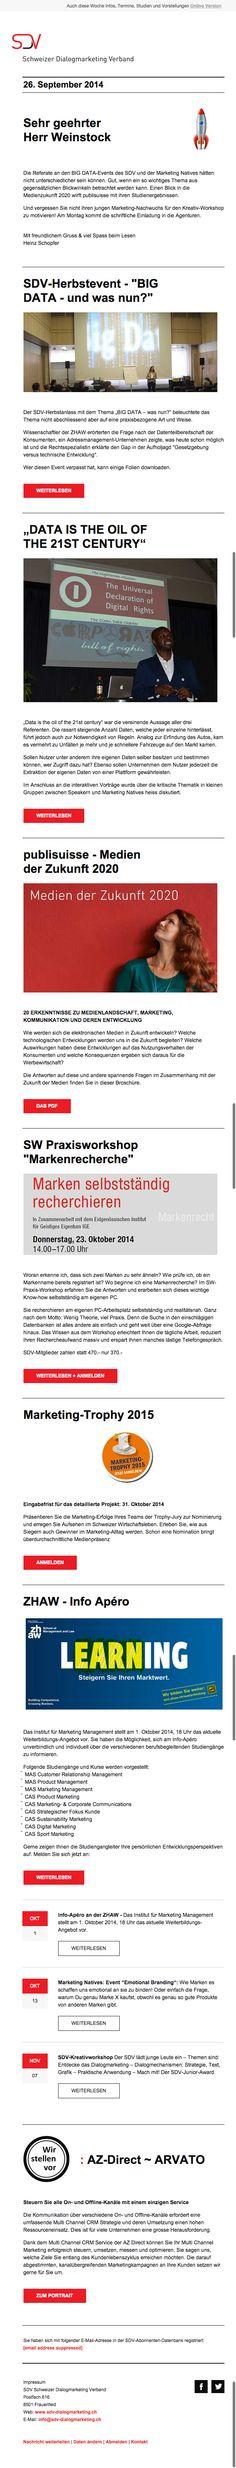 #SDV Schweizer Dialogmarketing Verband